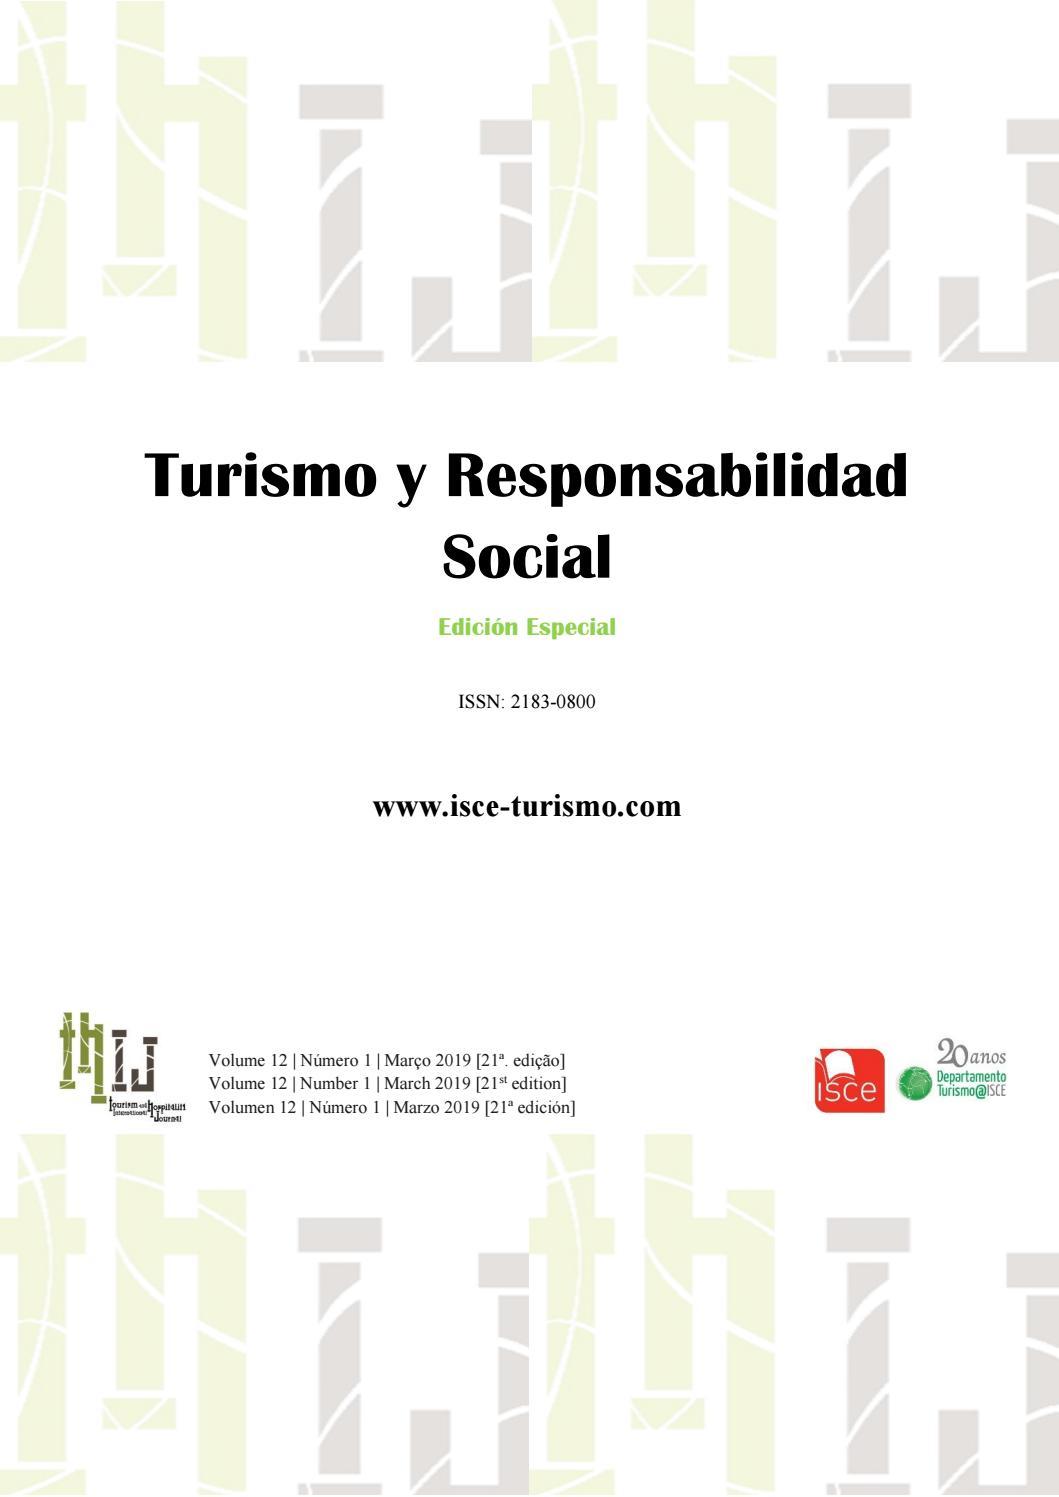 Thij Full Journal 12 1 By Turismoisce Issuu